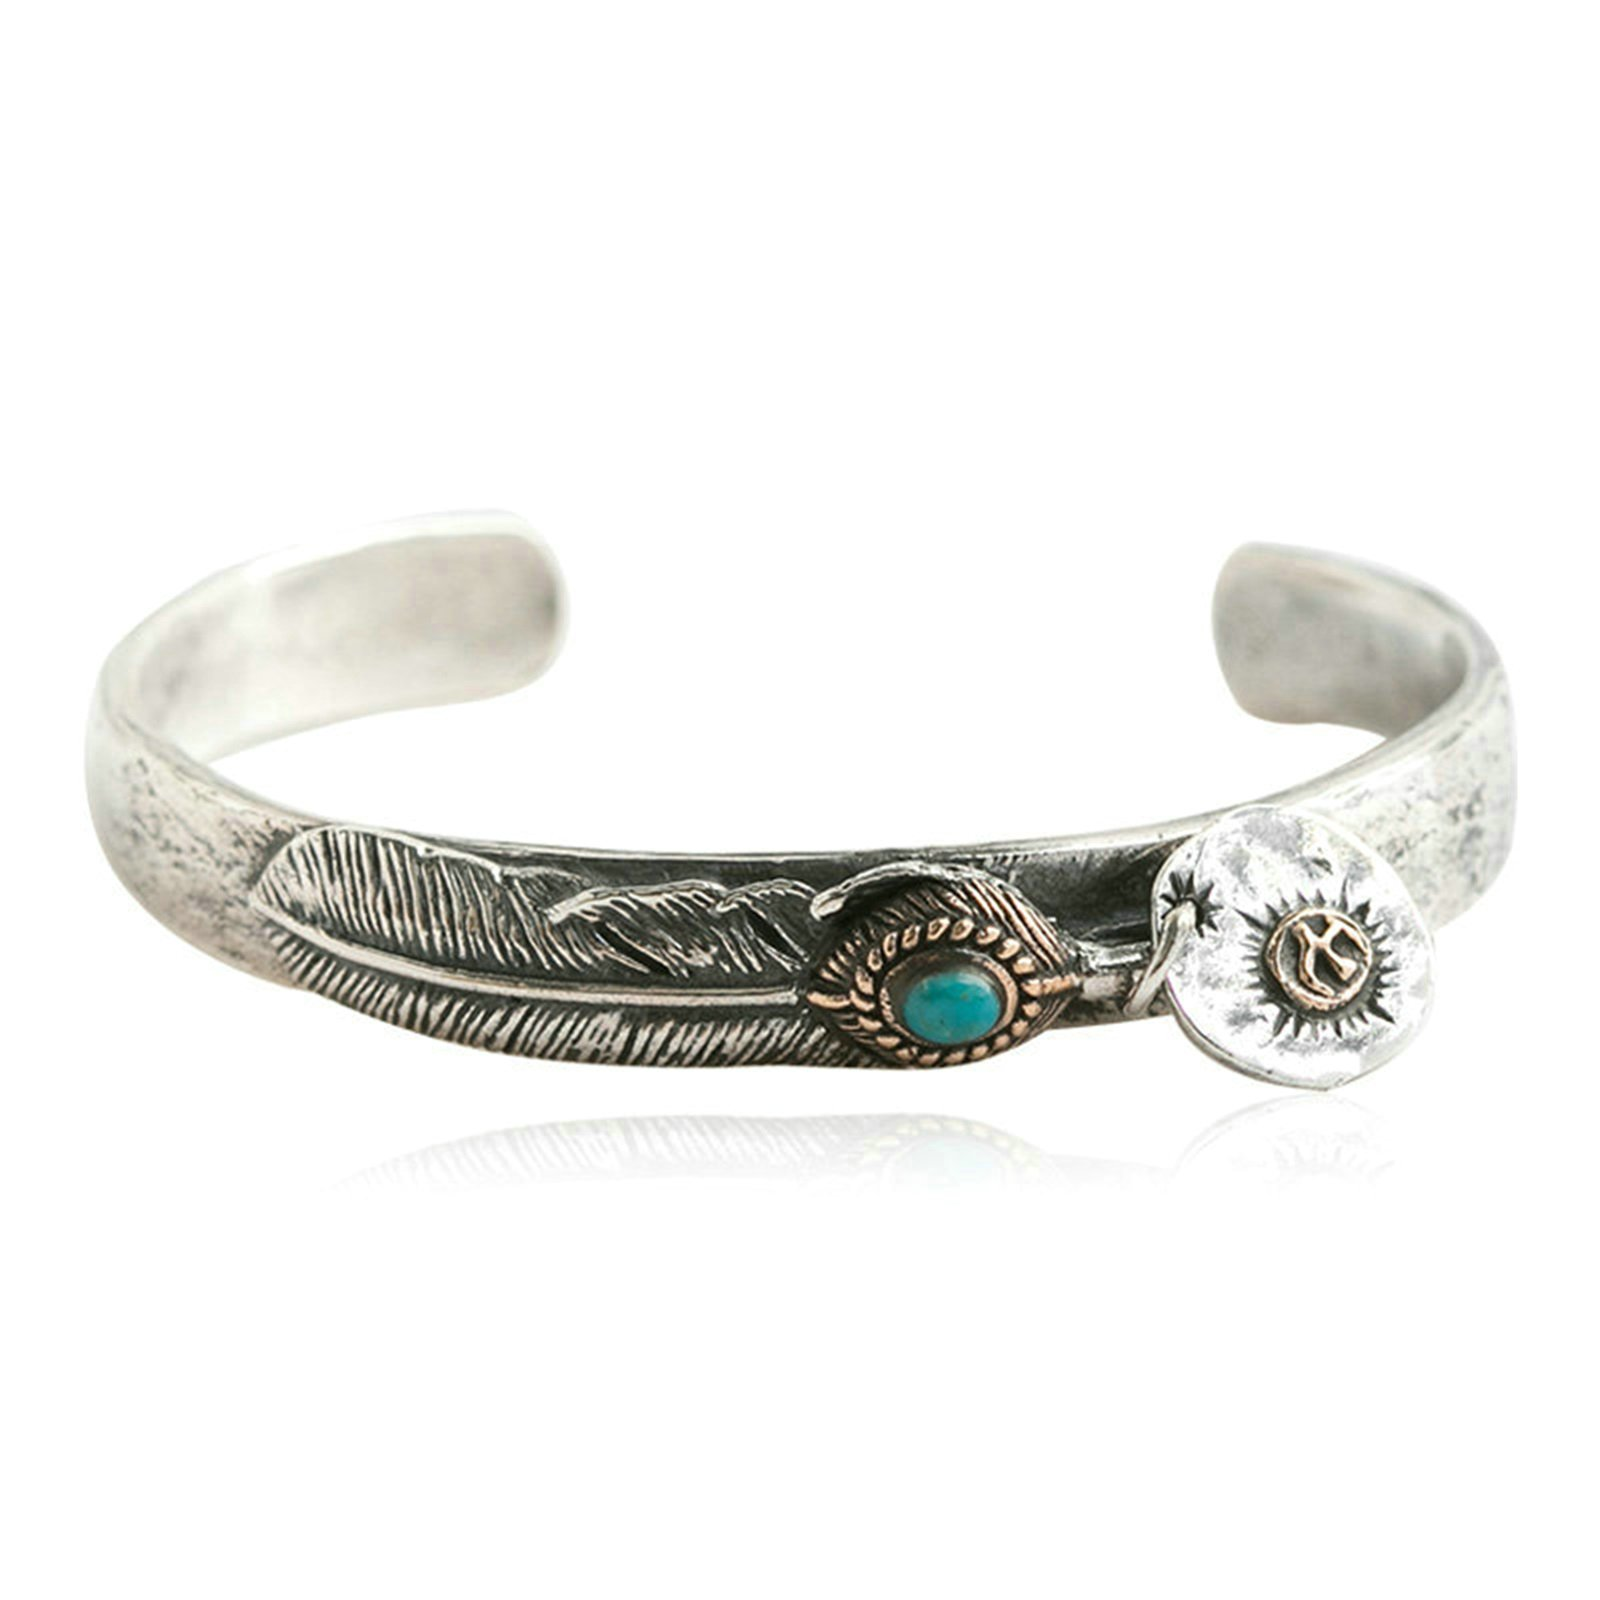 Daesar 925 Silver Bracelet For Men Feathers Opening Bracelet Silver